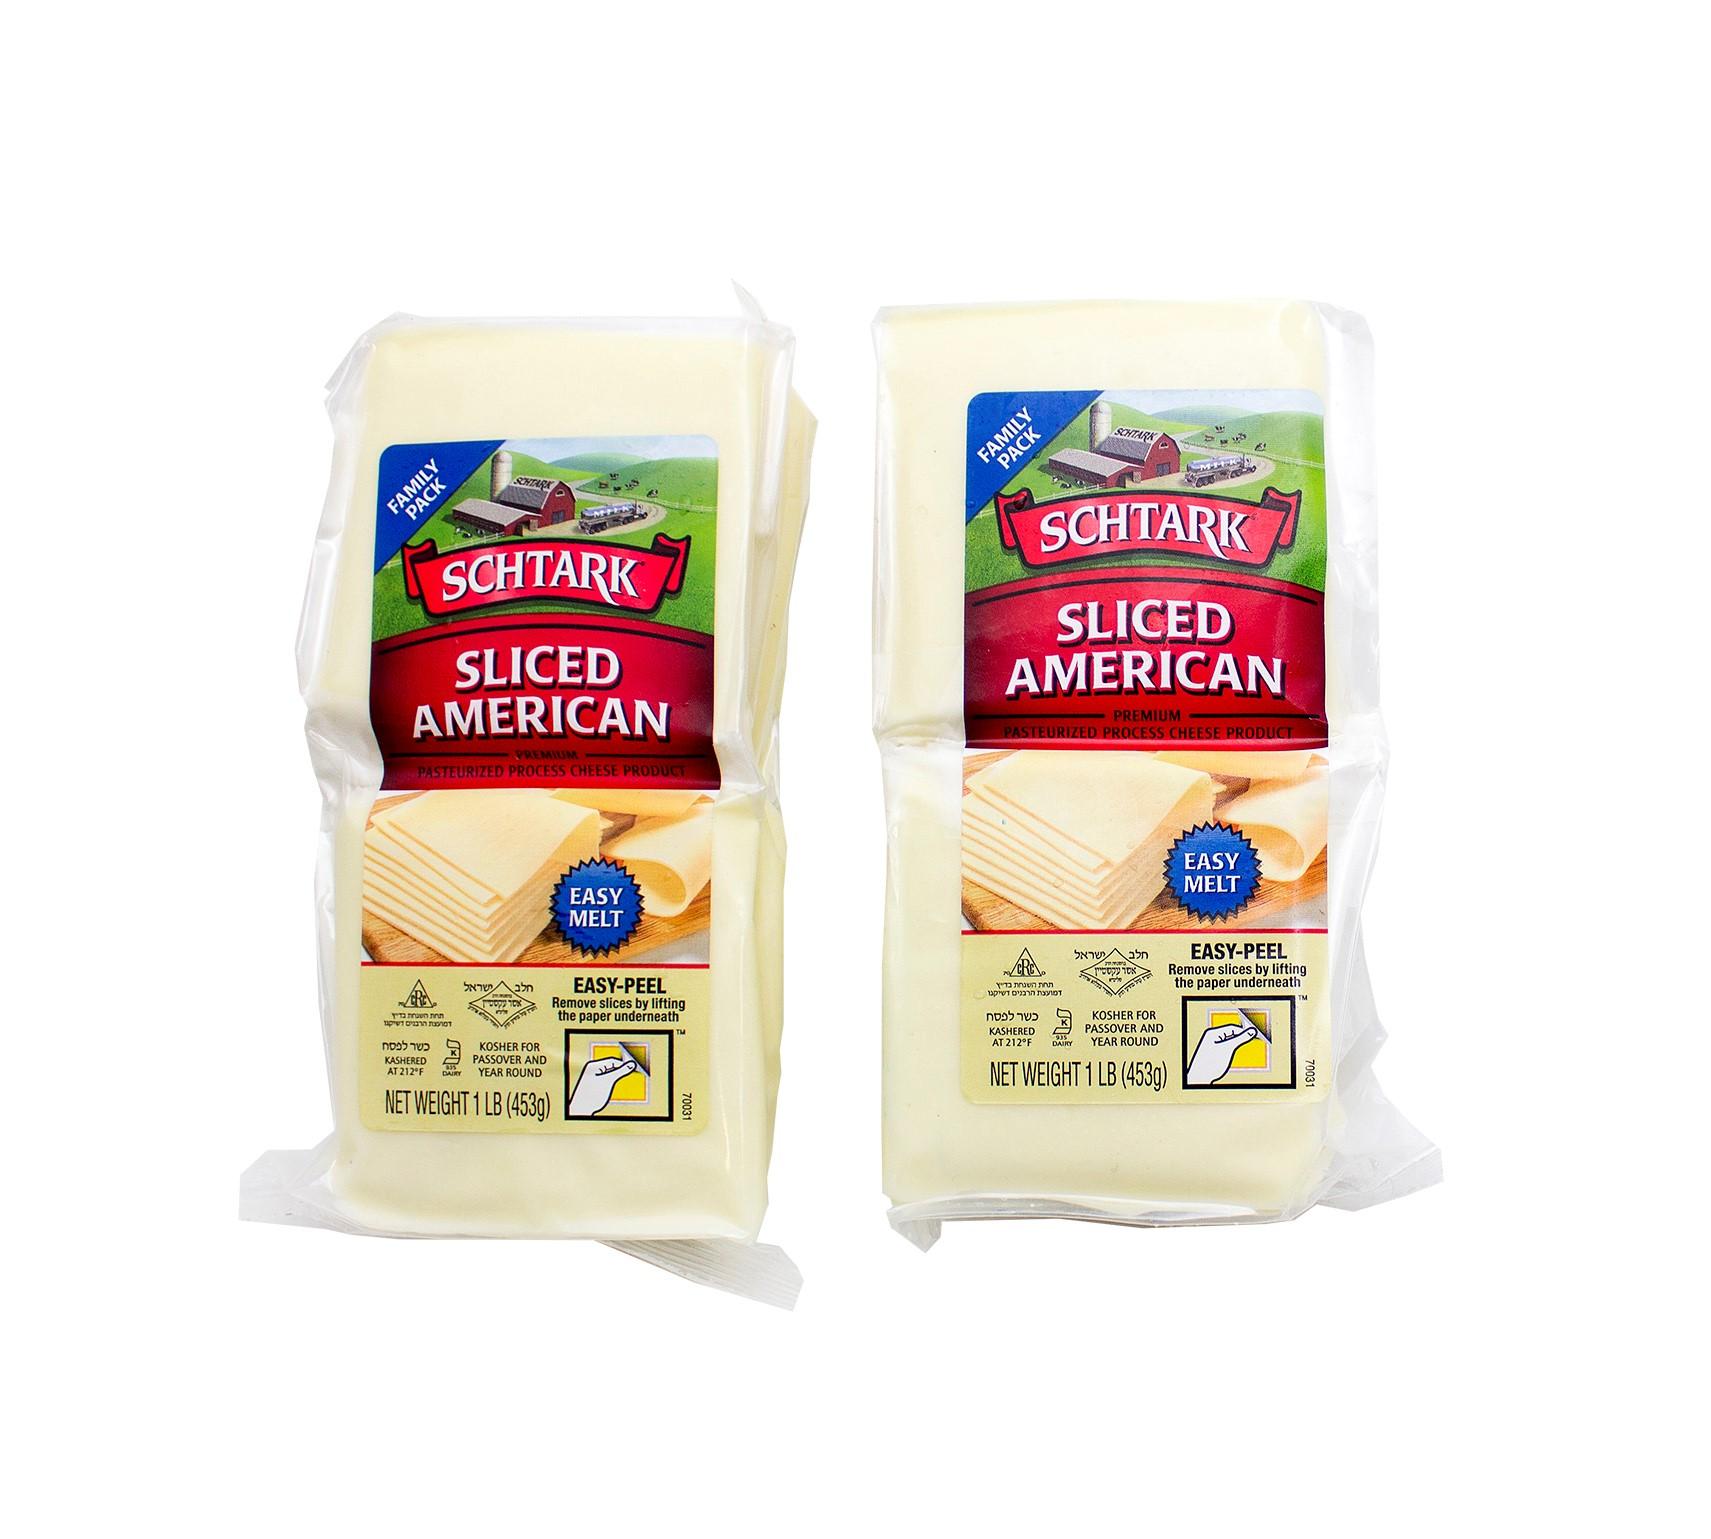 Schtark Super Kosher Cheese American Slices                       1 Pound (Pack of 2)